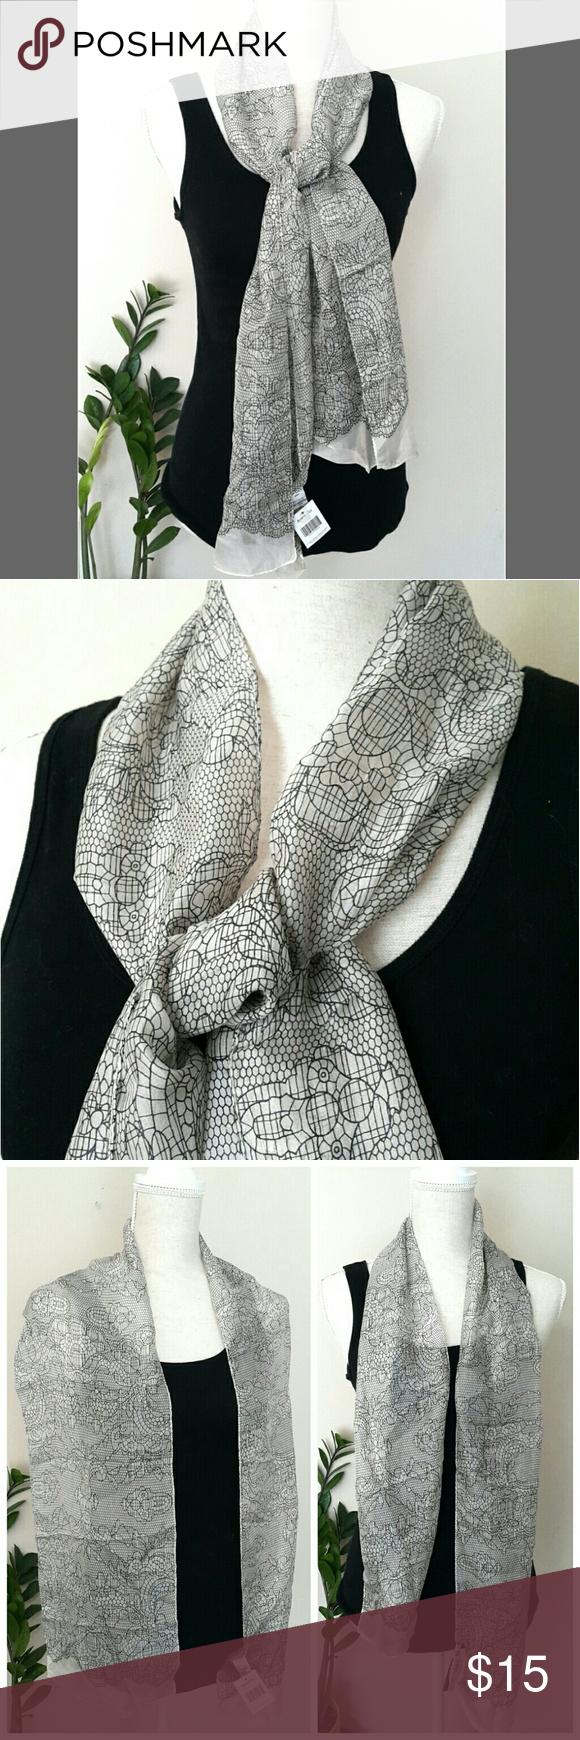 Accessorize Silk Scarf Nwt Clothes Design Chic Scarves Fashion